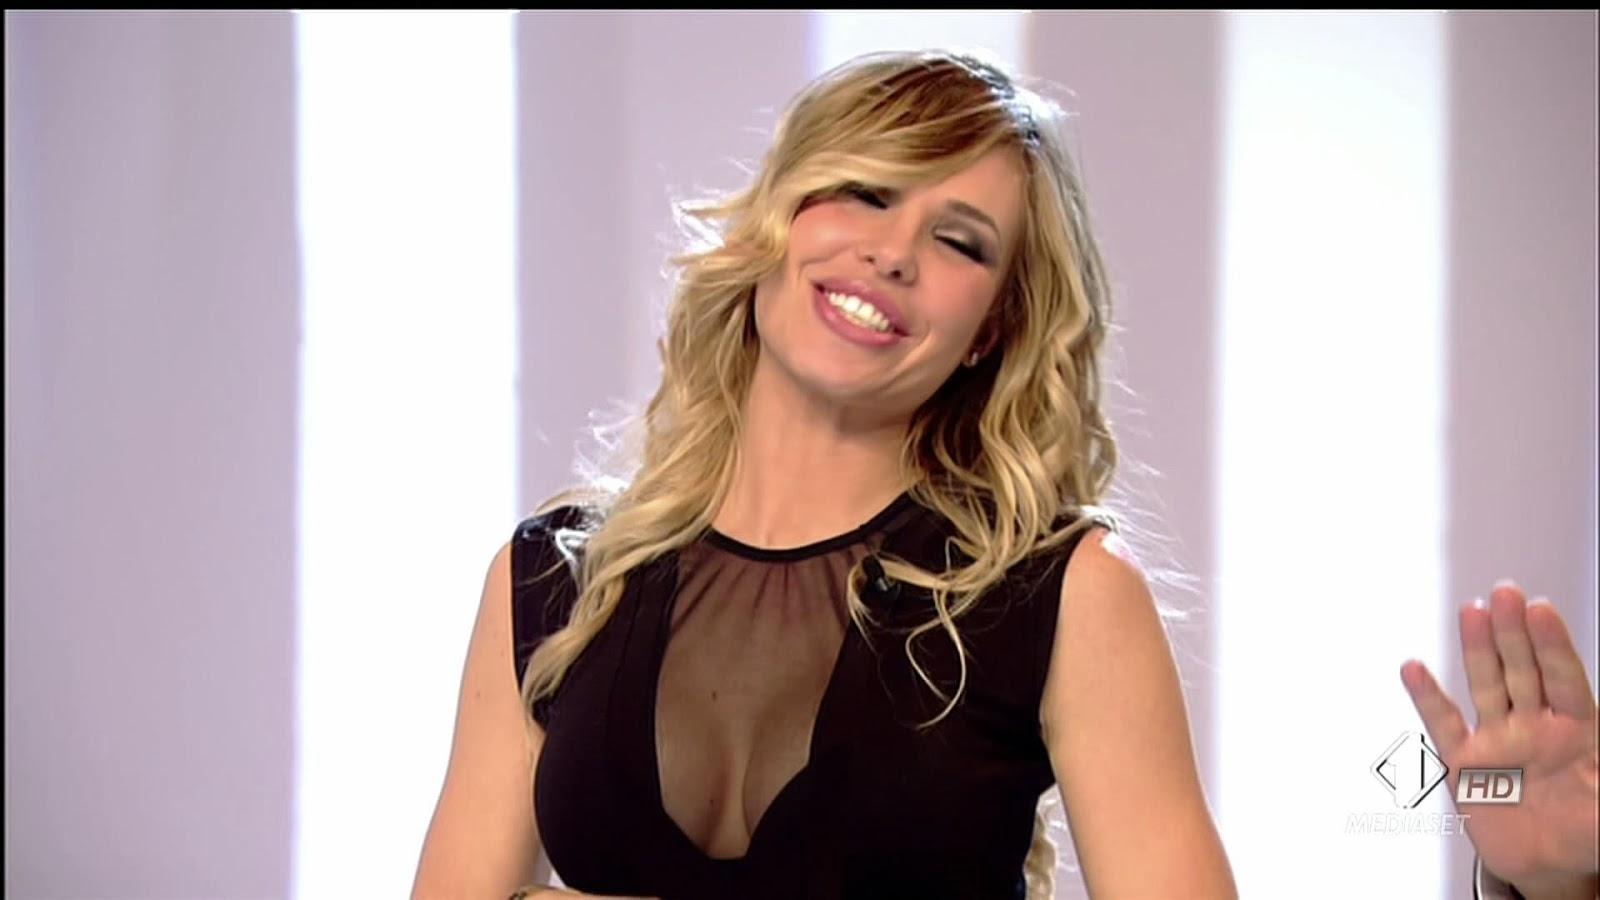 Iene: GNOCCACHANNEL_: Ilary Blasi Le Iene Show 26-11-13 VIDEO HD